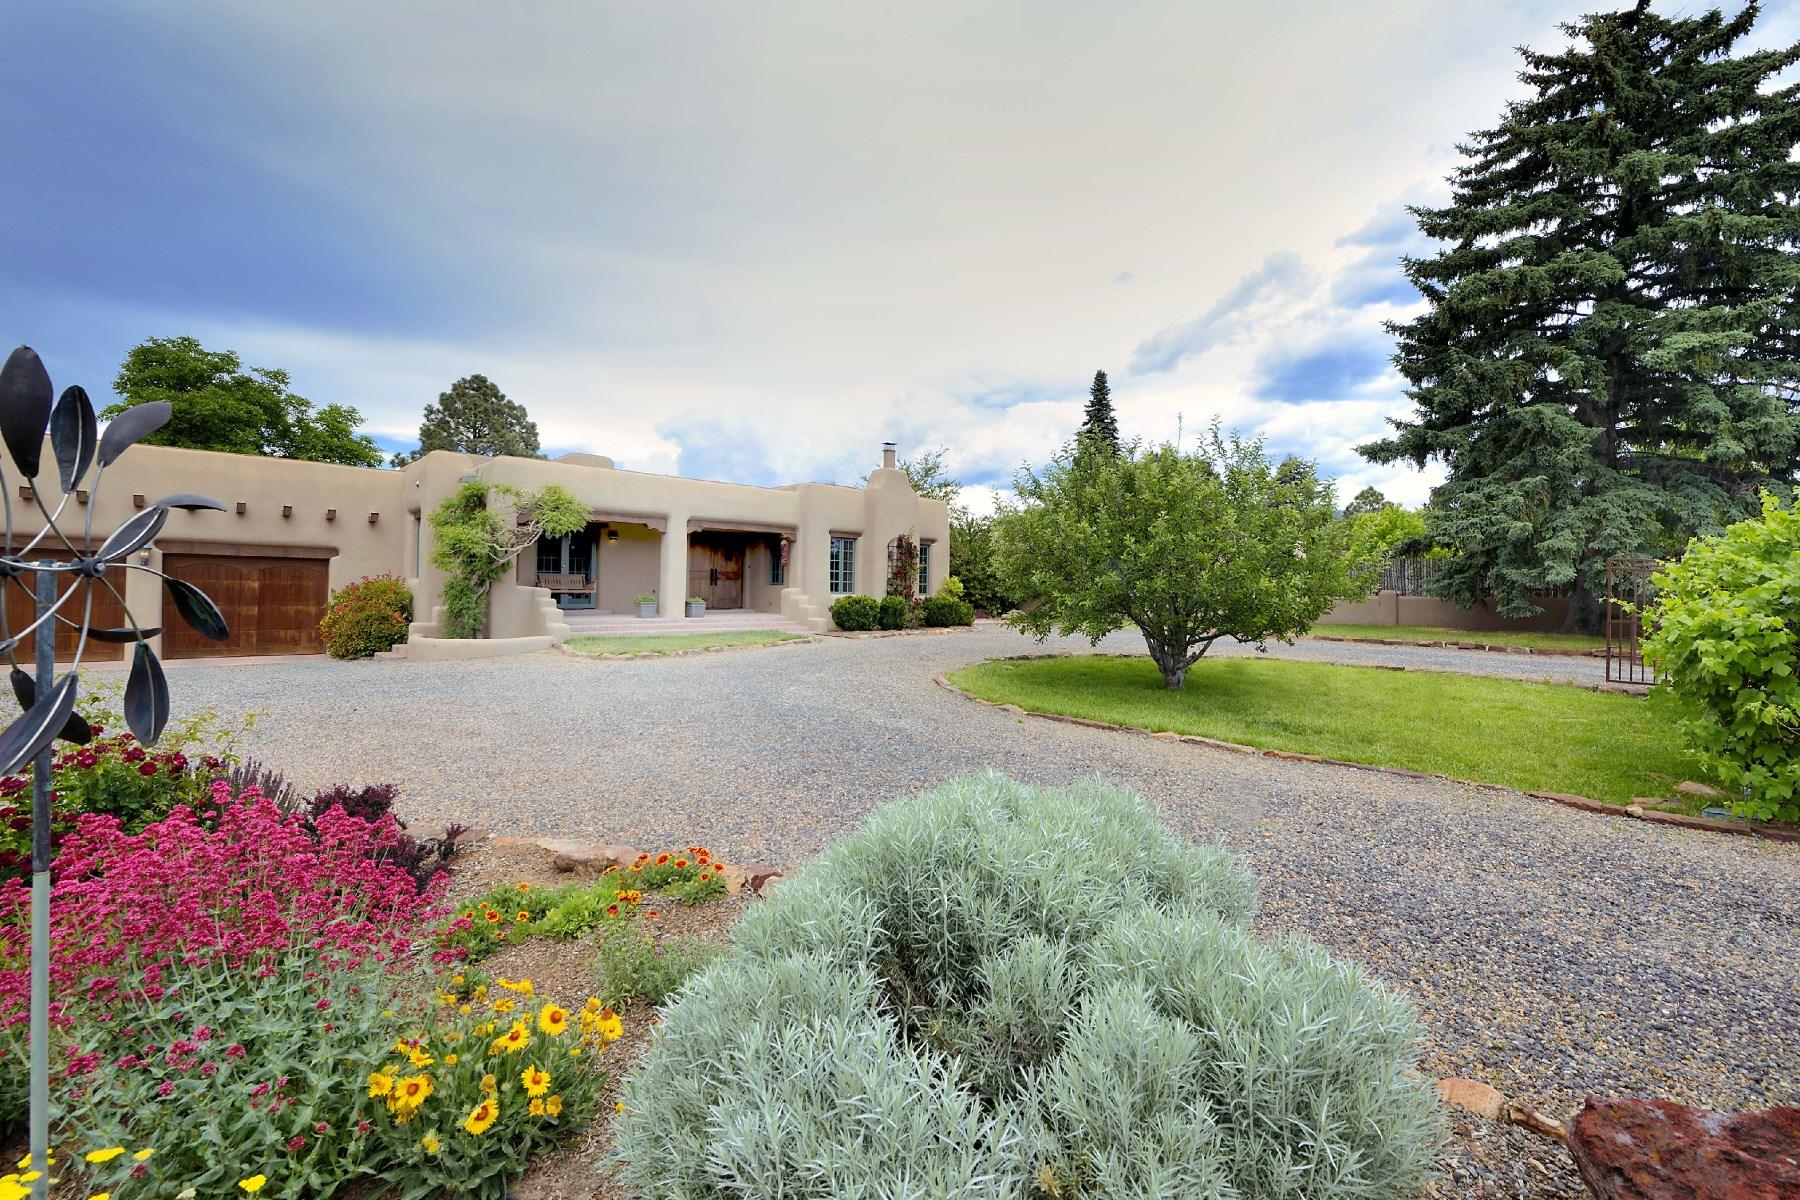 Einfamilienhaus für Verkauf beim 501 E. Coronado Road Santa Fe City Southeast, Santa Fe, New Mexico, 87505 Vereinigte Staaten